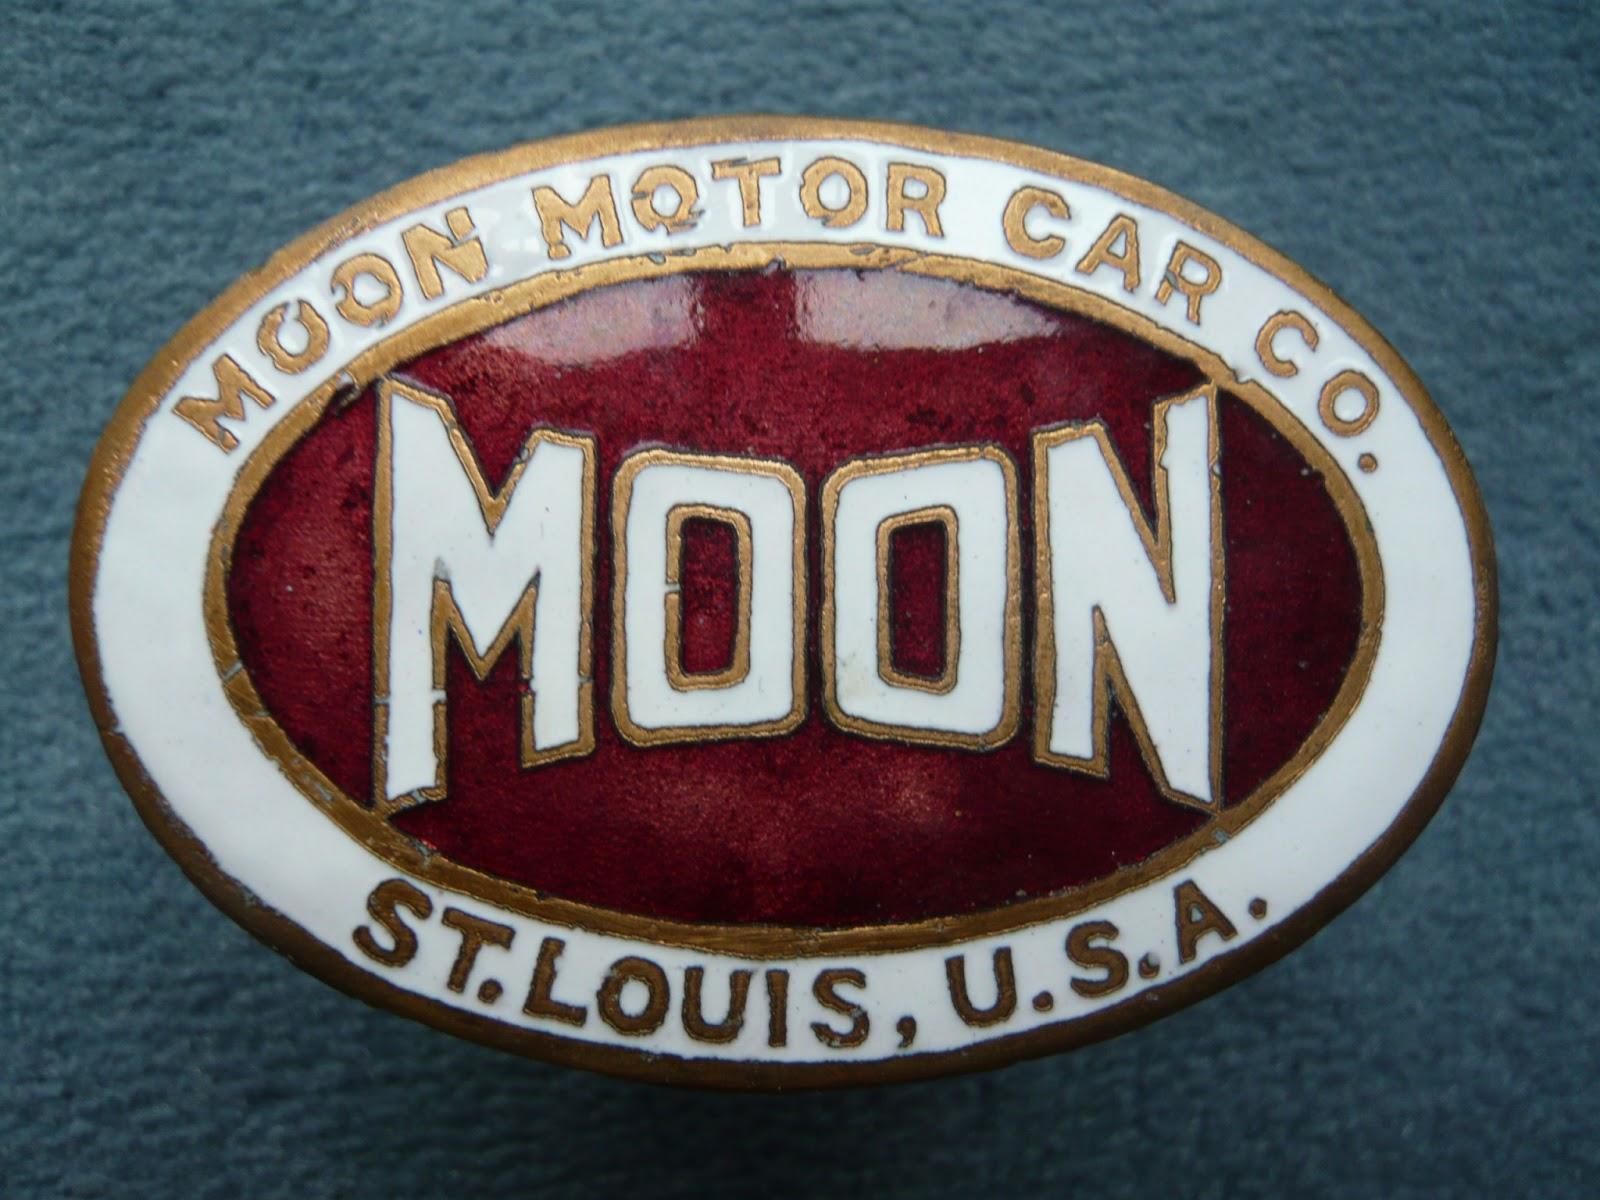 emblem three moons - photo #42